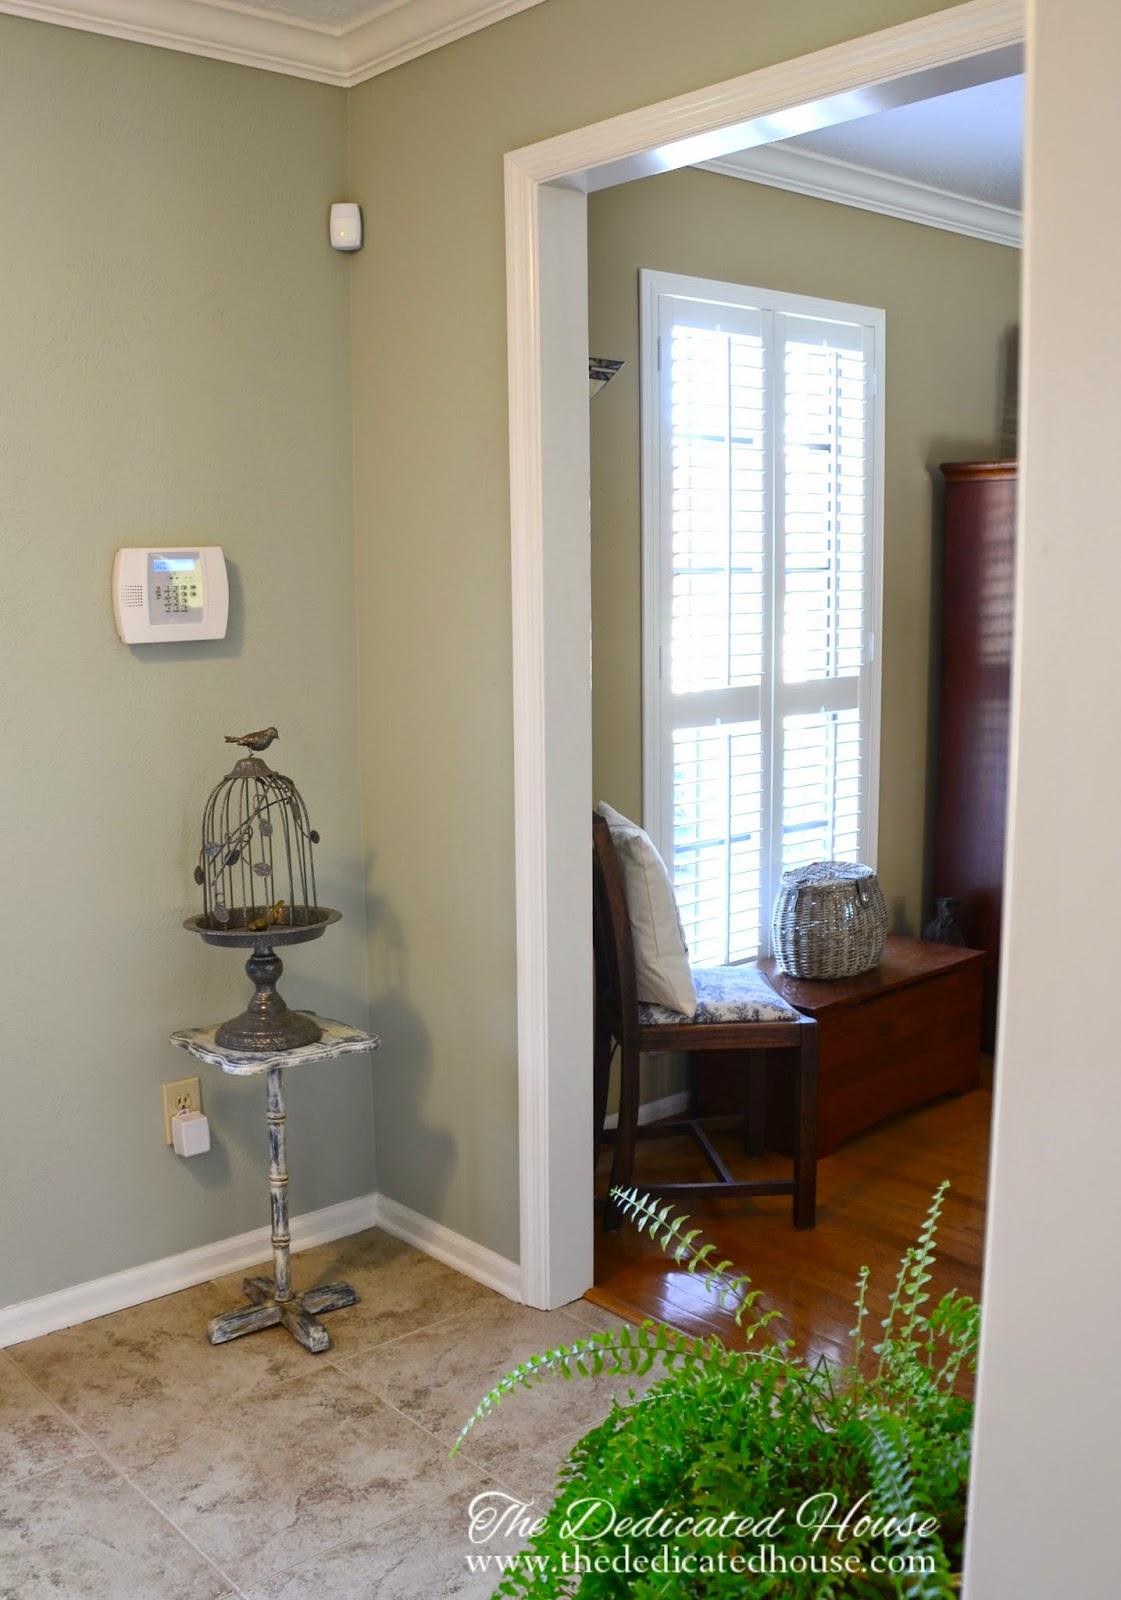 Mini House Tour {Guest Post} - My Suburban Kitchen